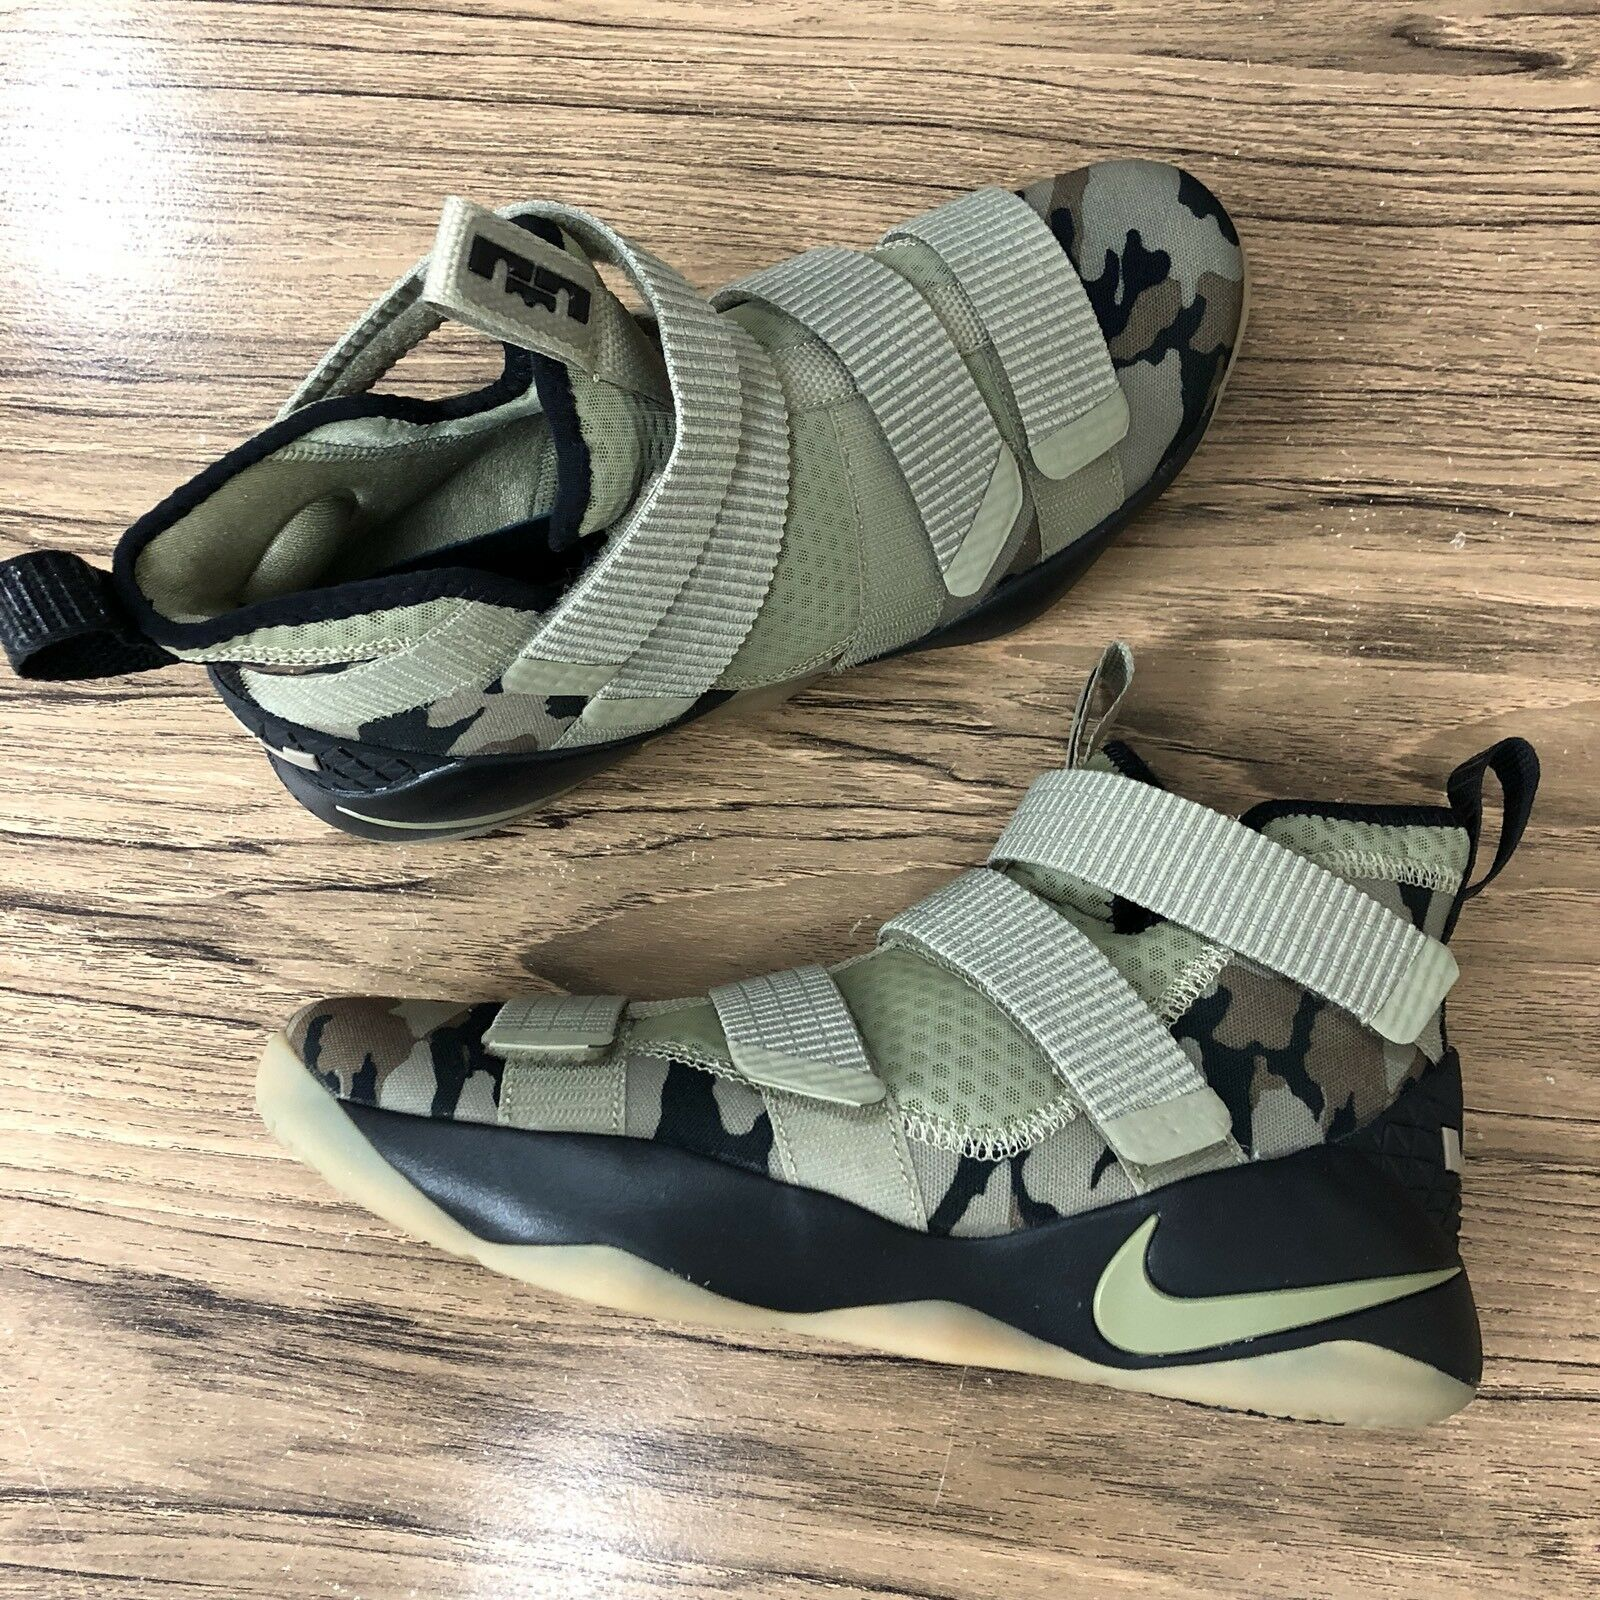 A700 nike lebron soldato xi 897644-200 Uomo basket scarpe taglia 10 nuovi